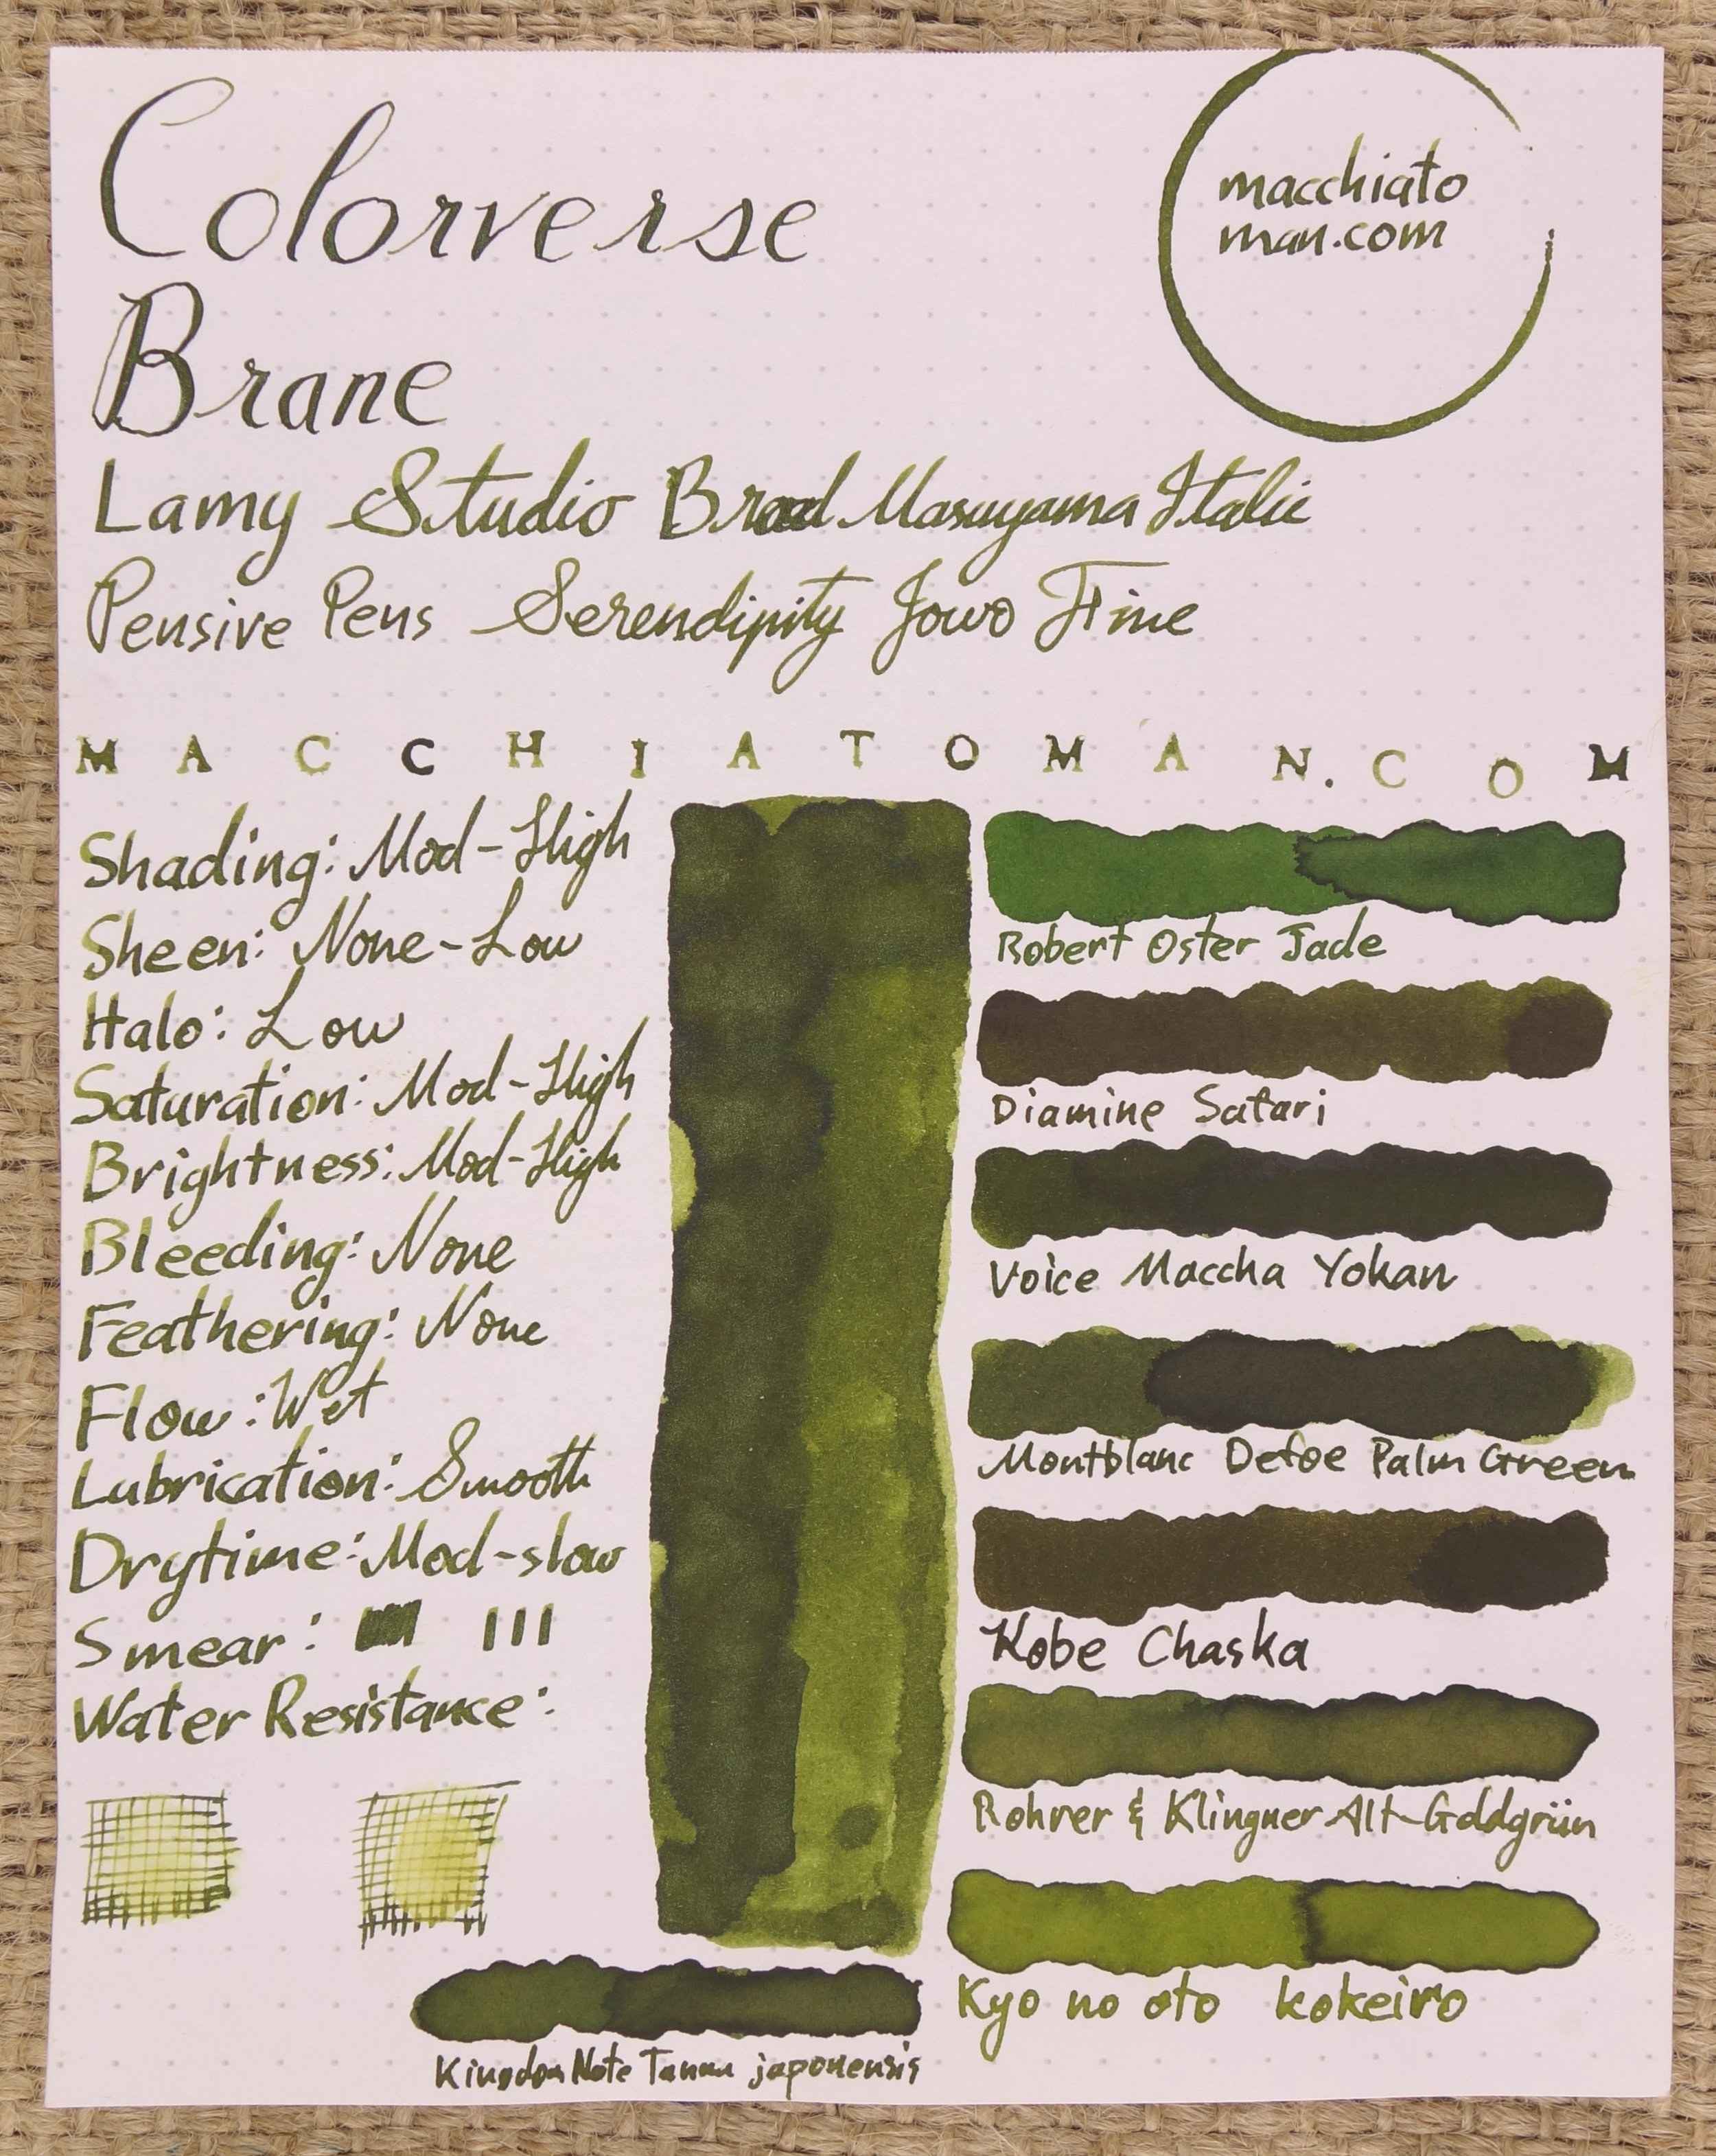 Review Brane Rhodia.jpg